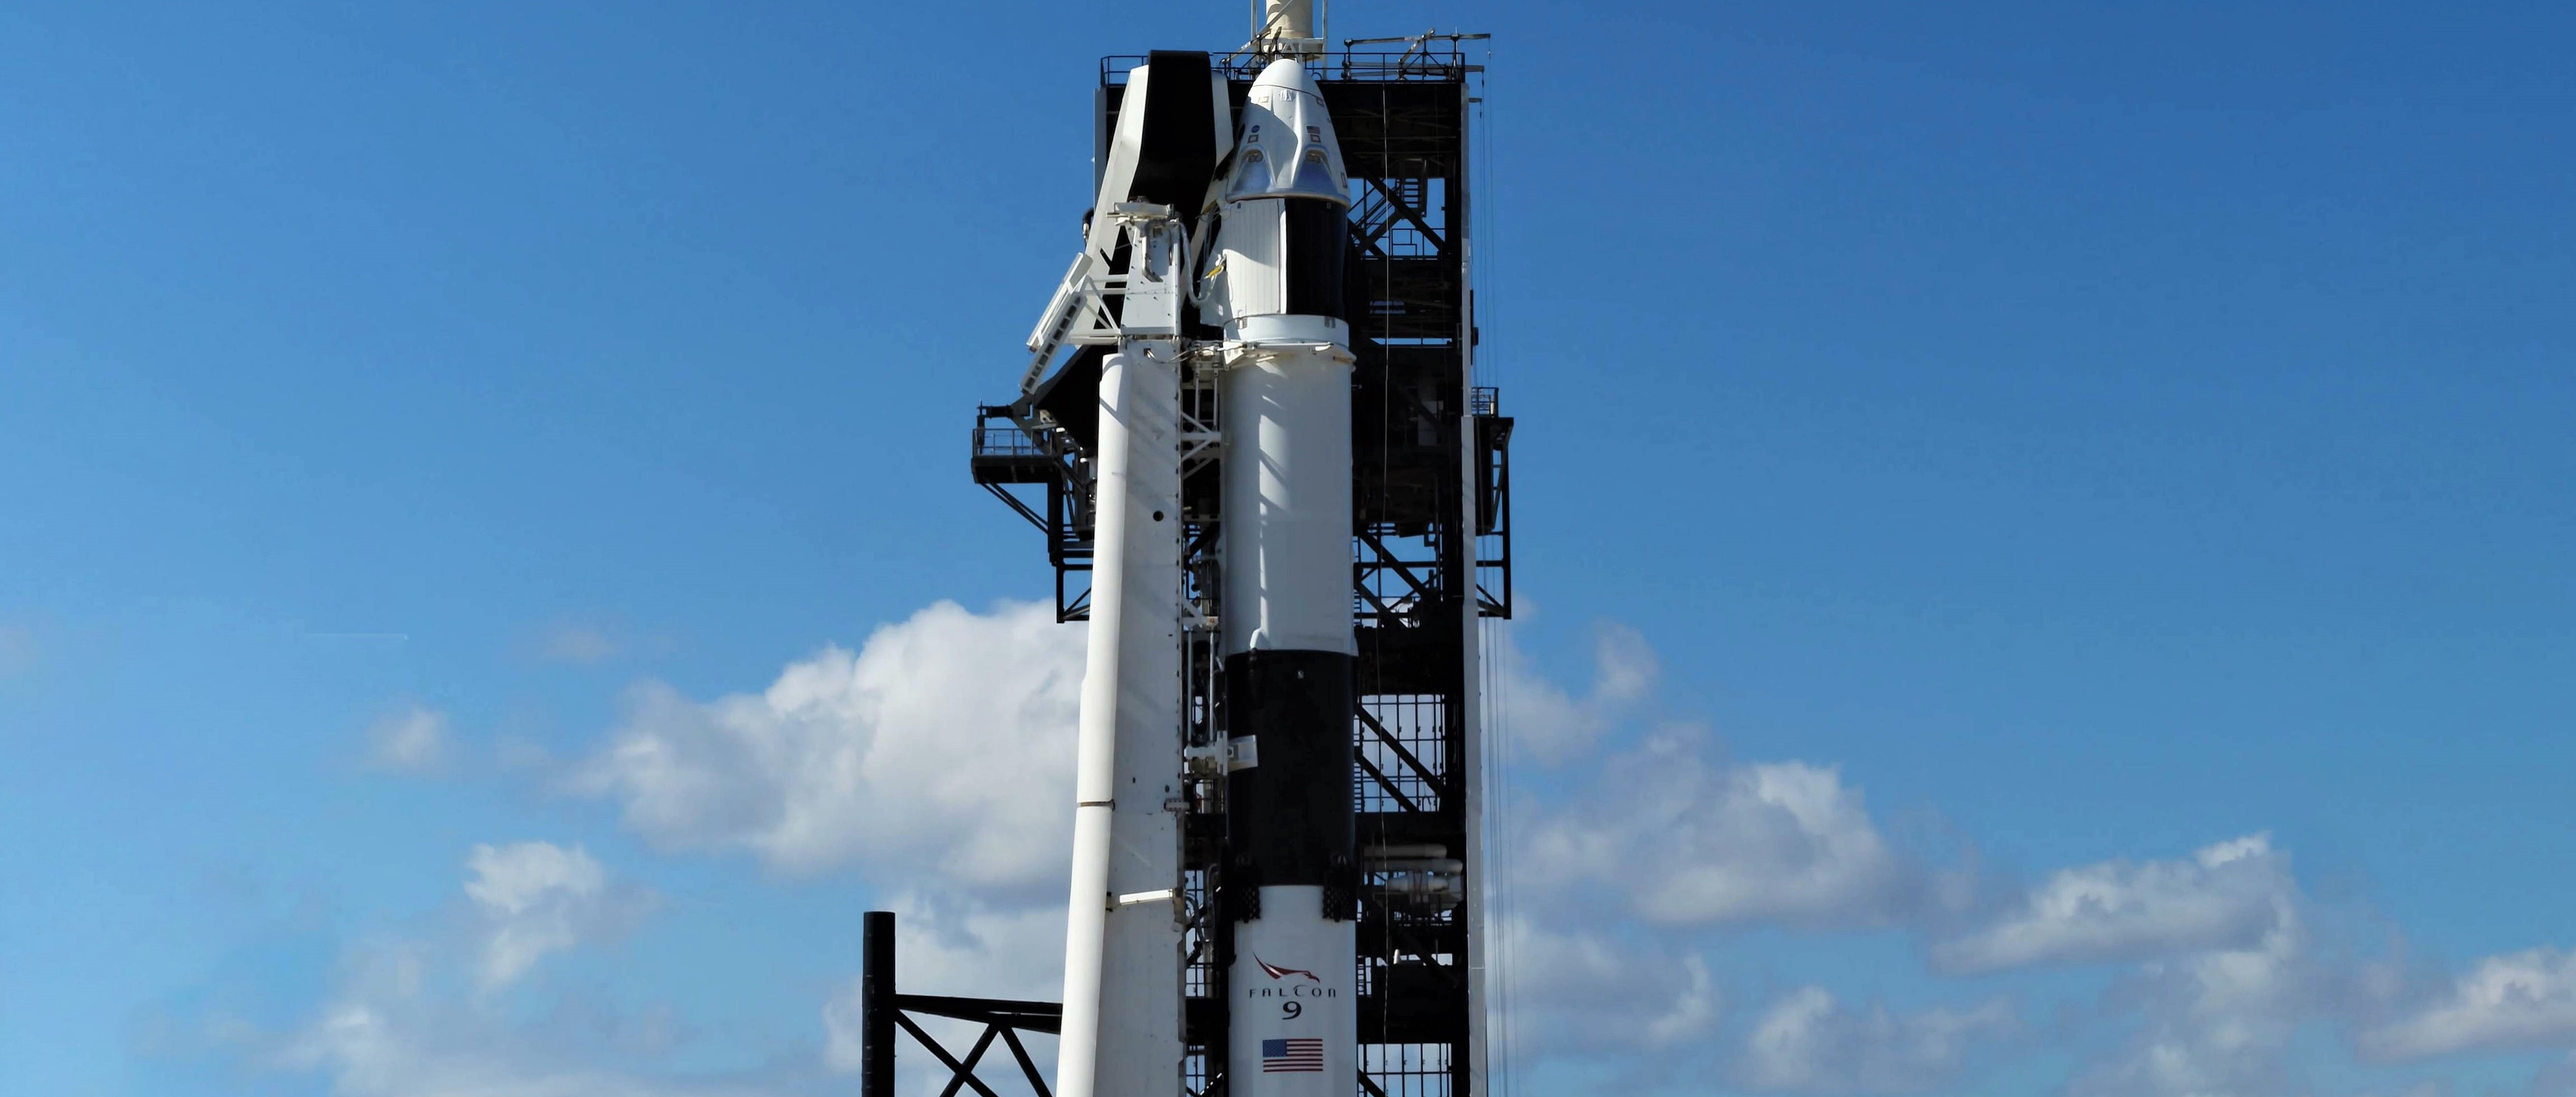 Crew Dragon Falcon 9 DM-1 vertical 39A (SpaceX) pano 1 crop